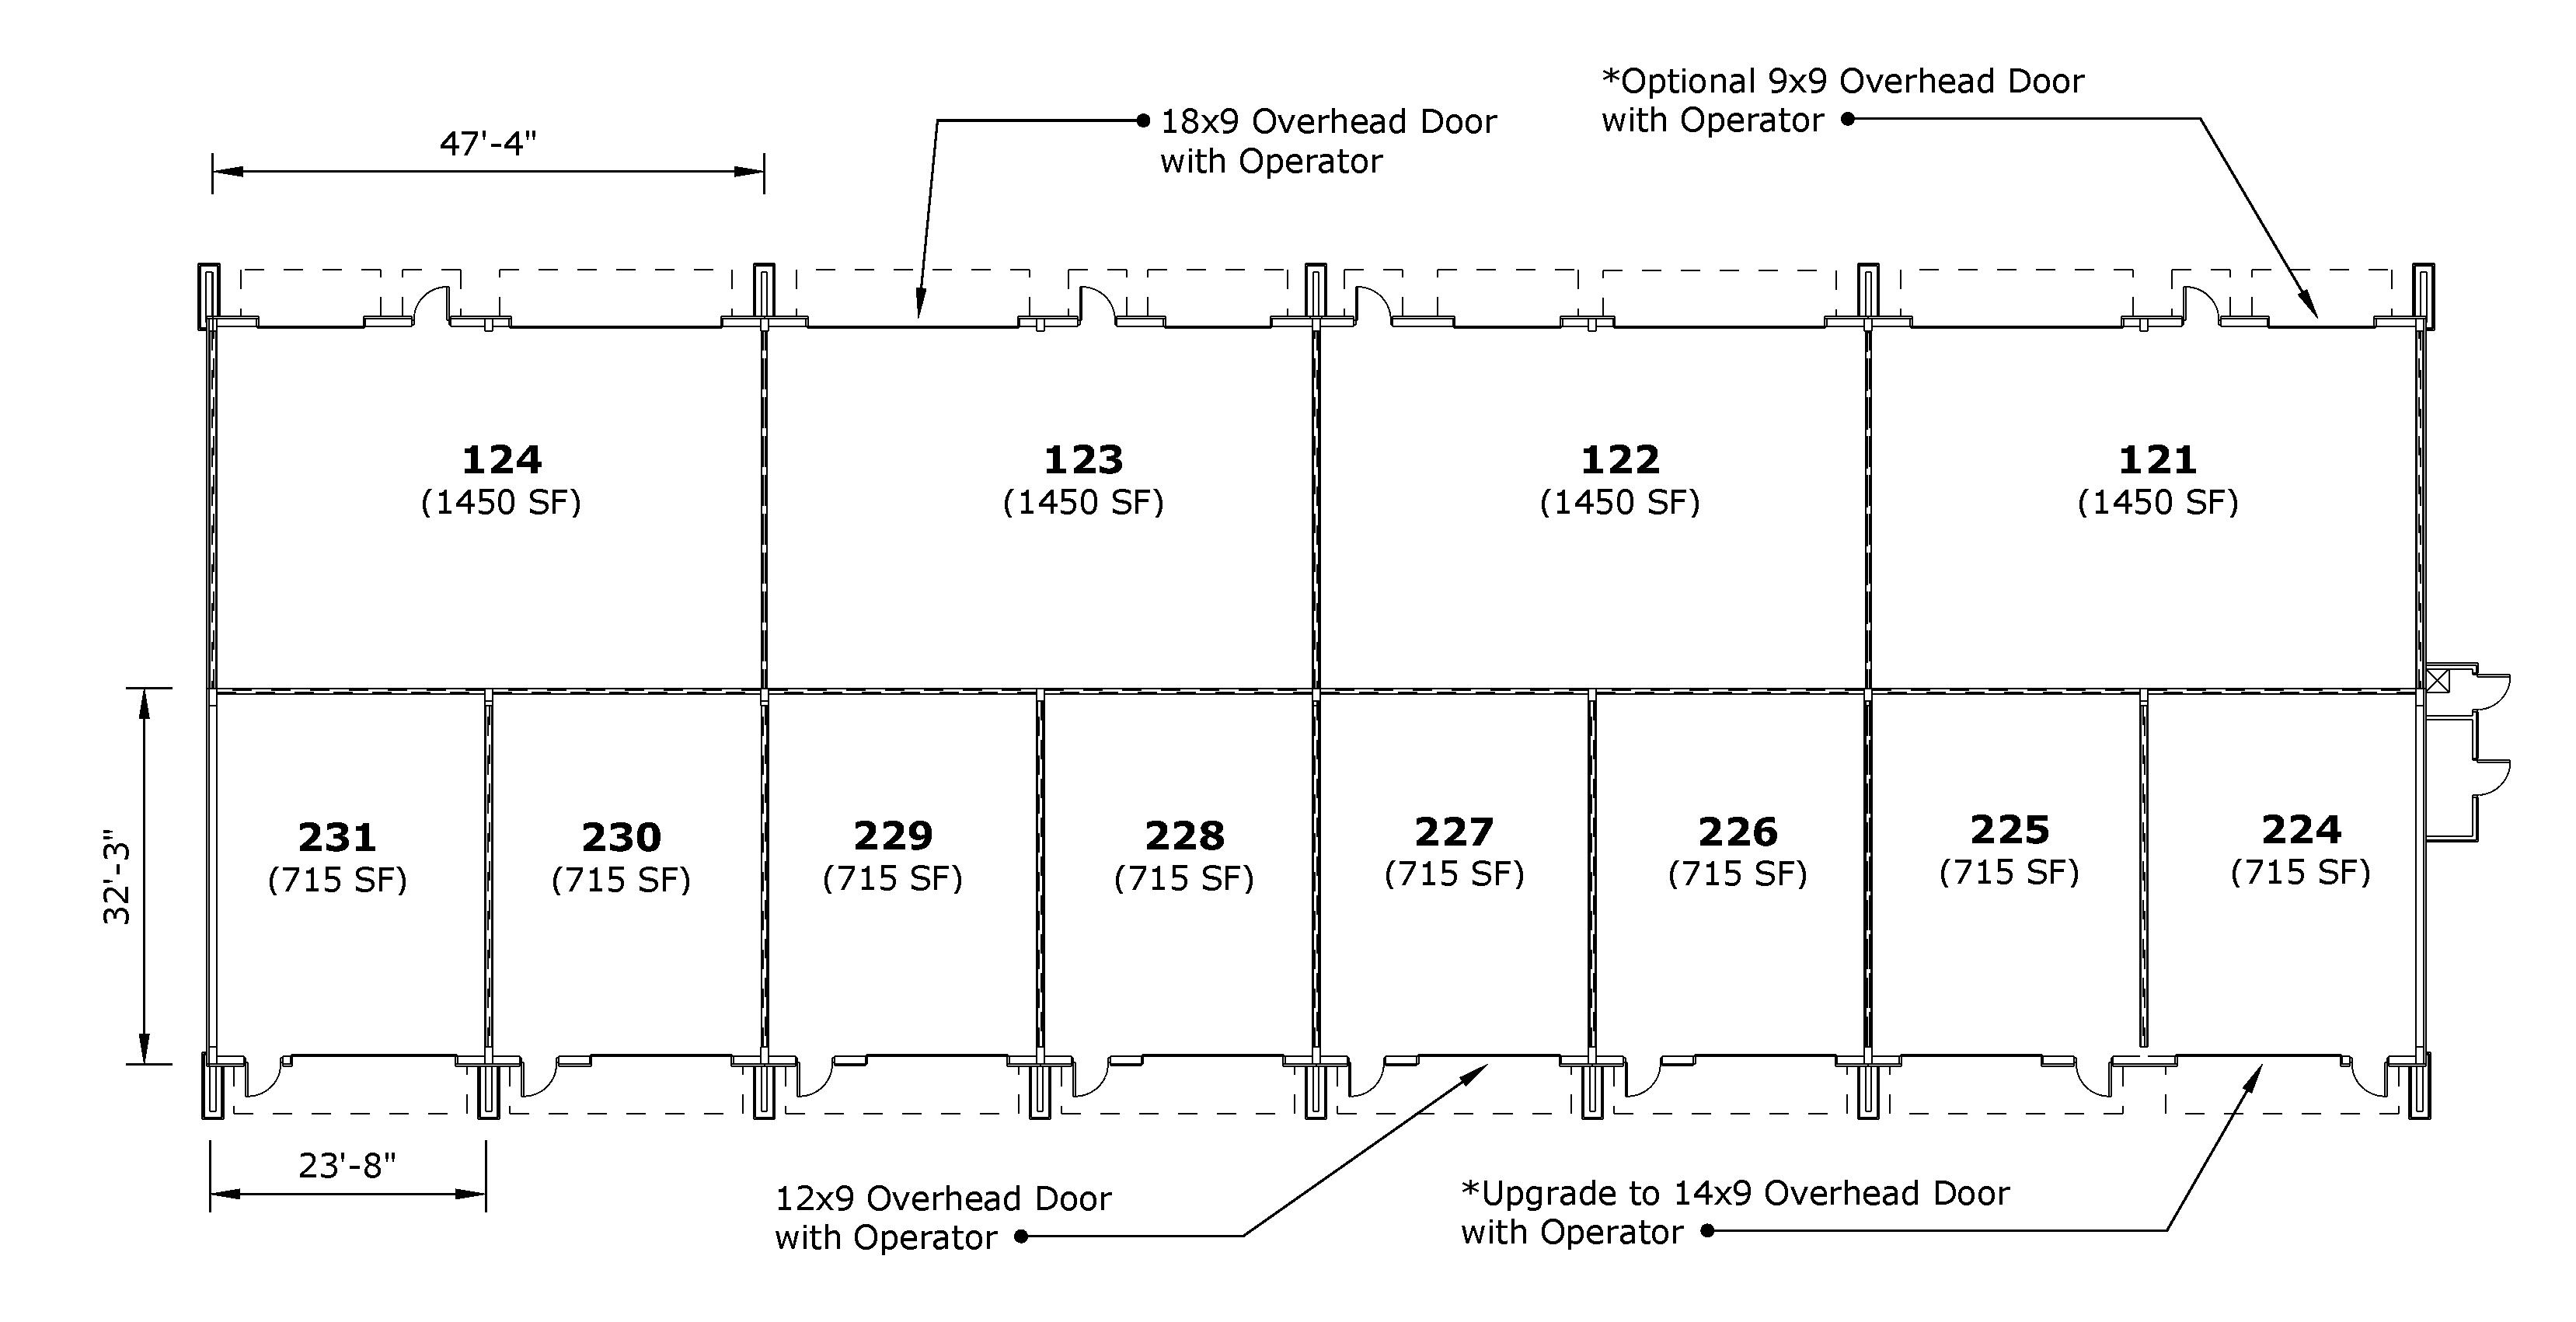 BLD 3 Full Bld Final e1633377740690 - Track Side Condos